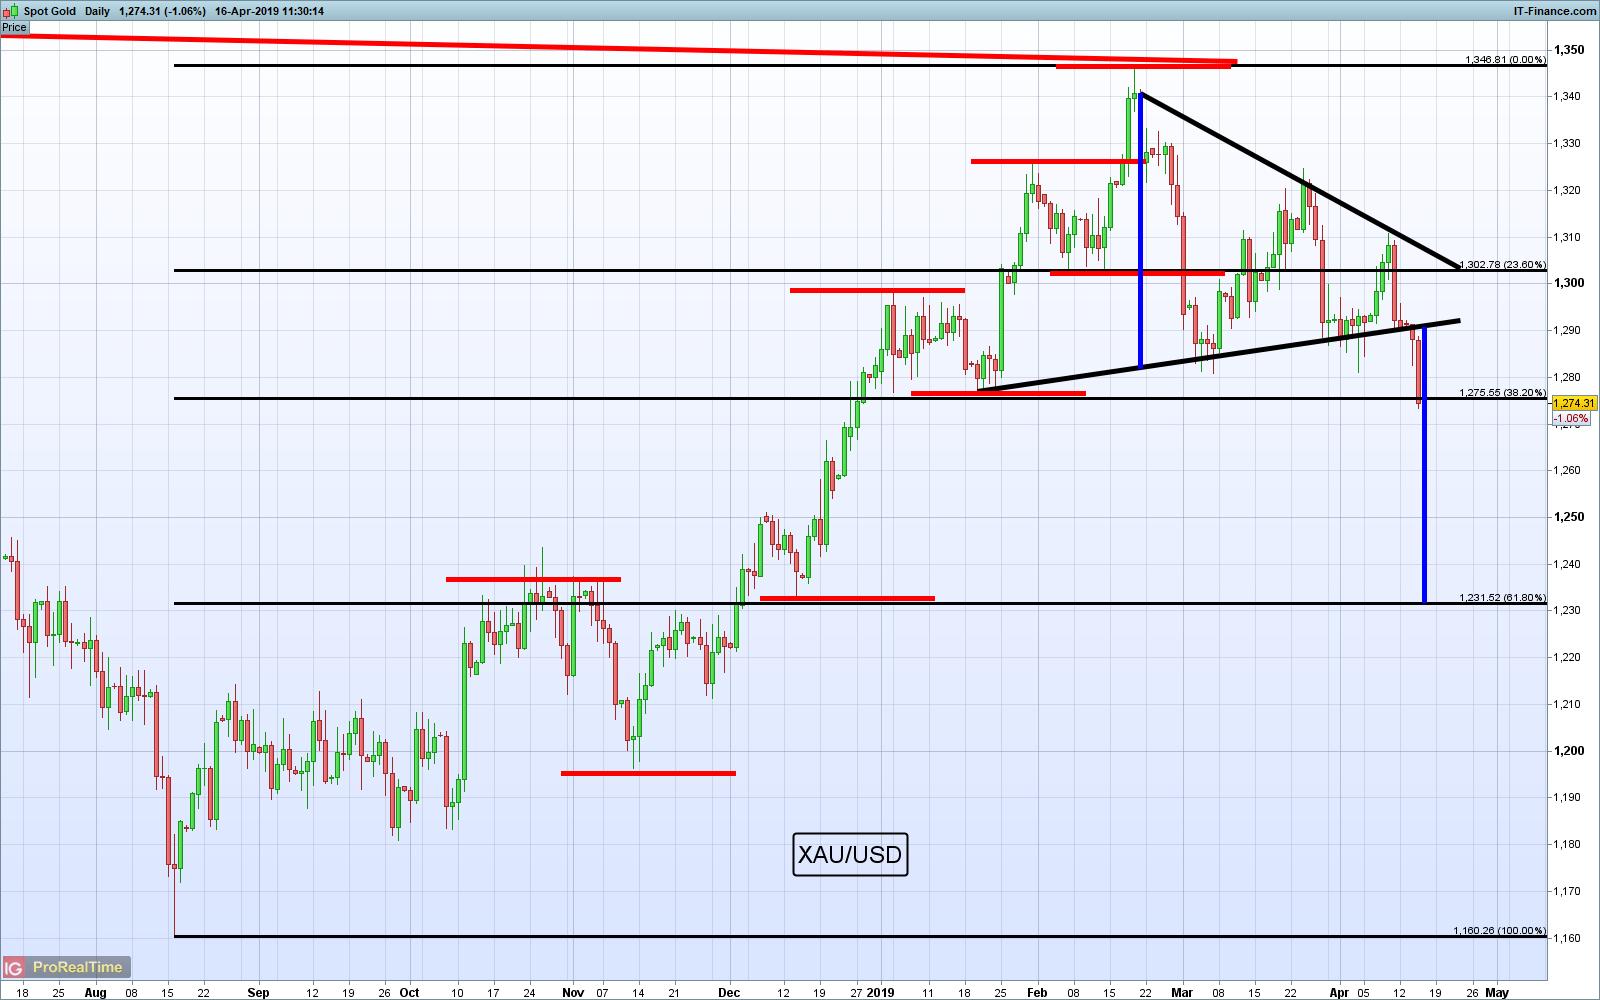 Gráfico de Trading de Oro